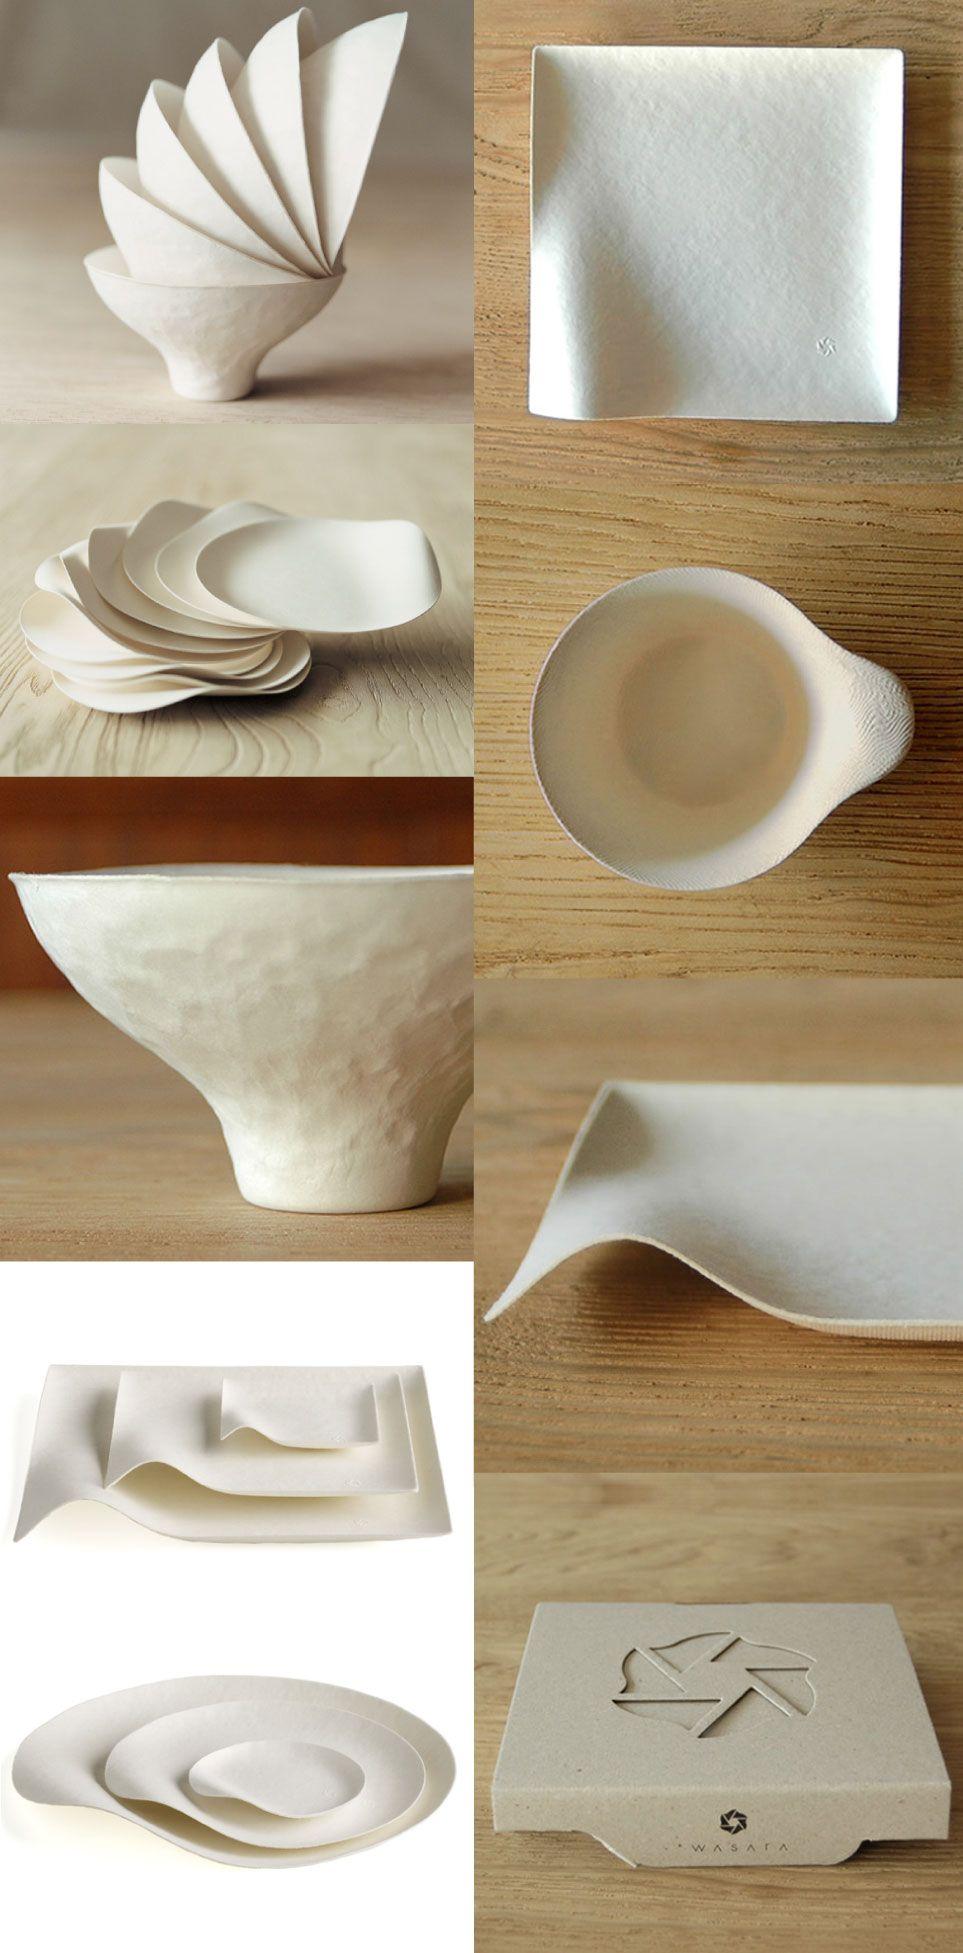 reed + bamboo+ bagasse pulp u003d beautiful disposable tableware u003d Wasara Get your own pulp at .purelypulp.com & reed + bamboo+ bagasse pulp u003d beautiful disposable tableware ...